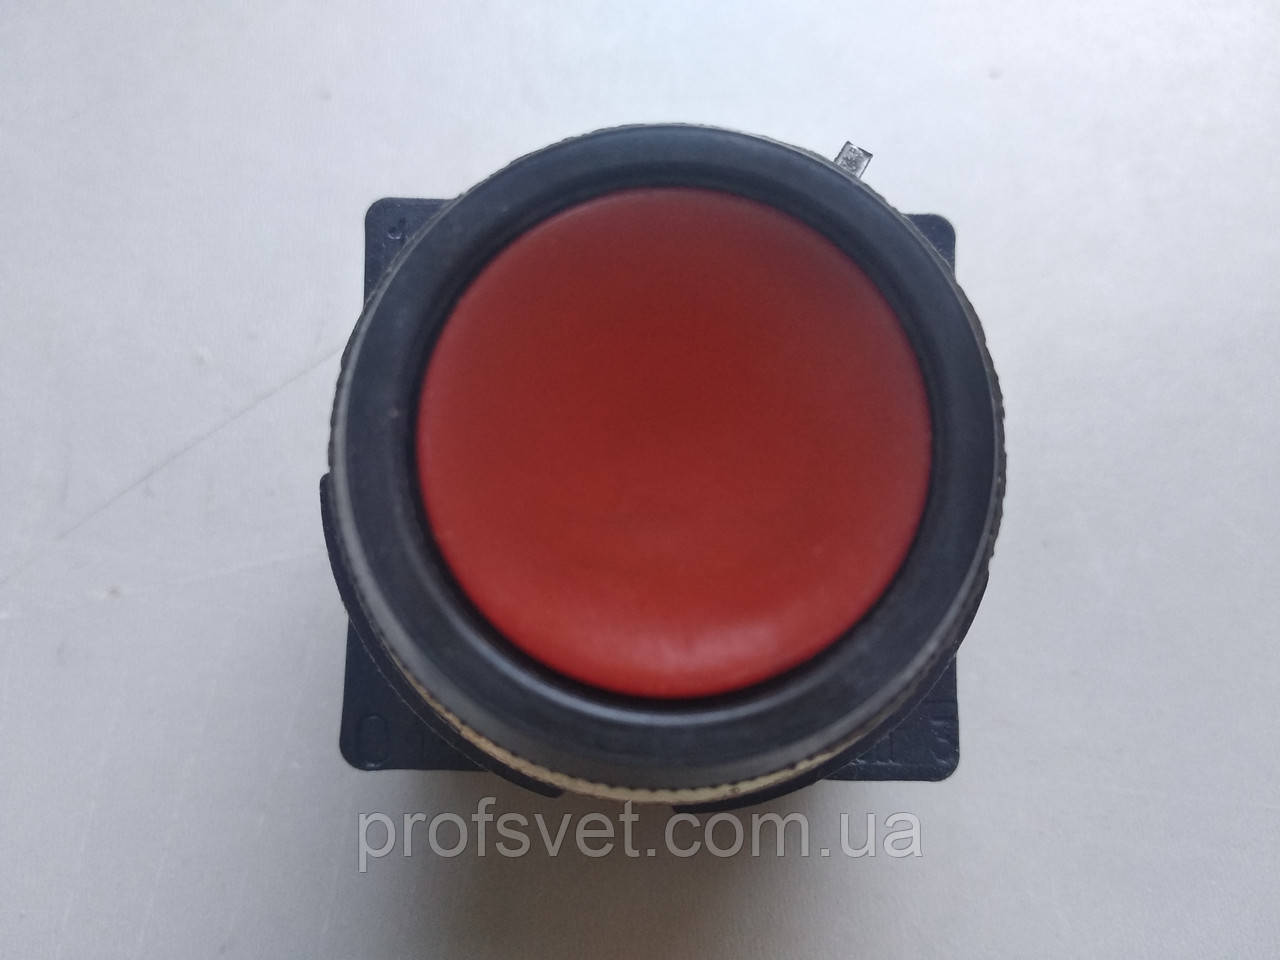 Кнопка КЕ-011